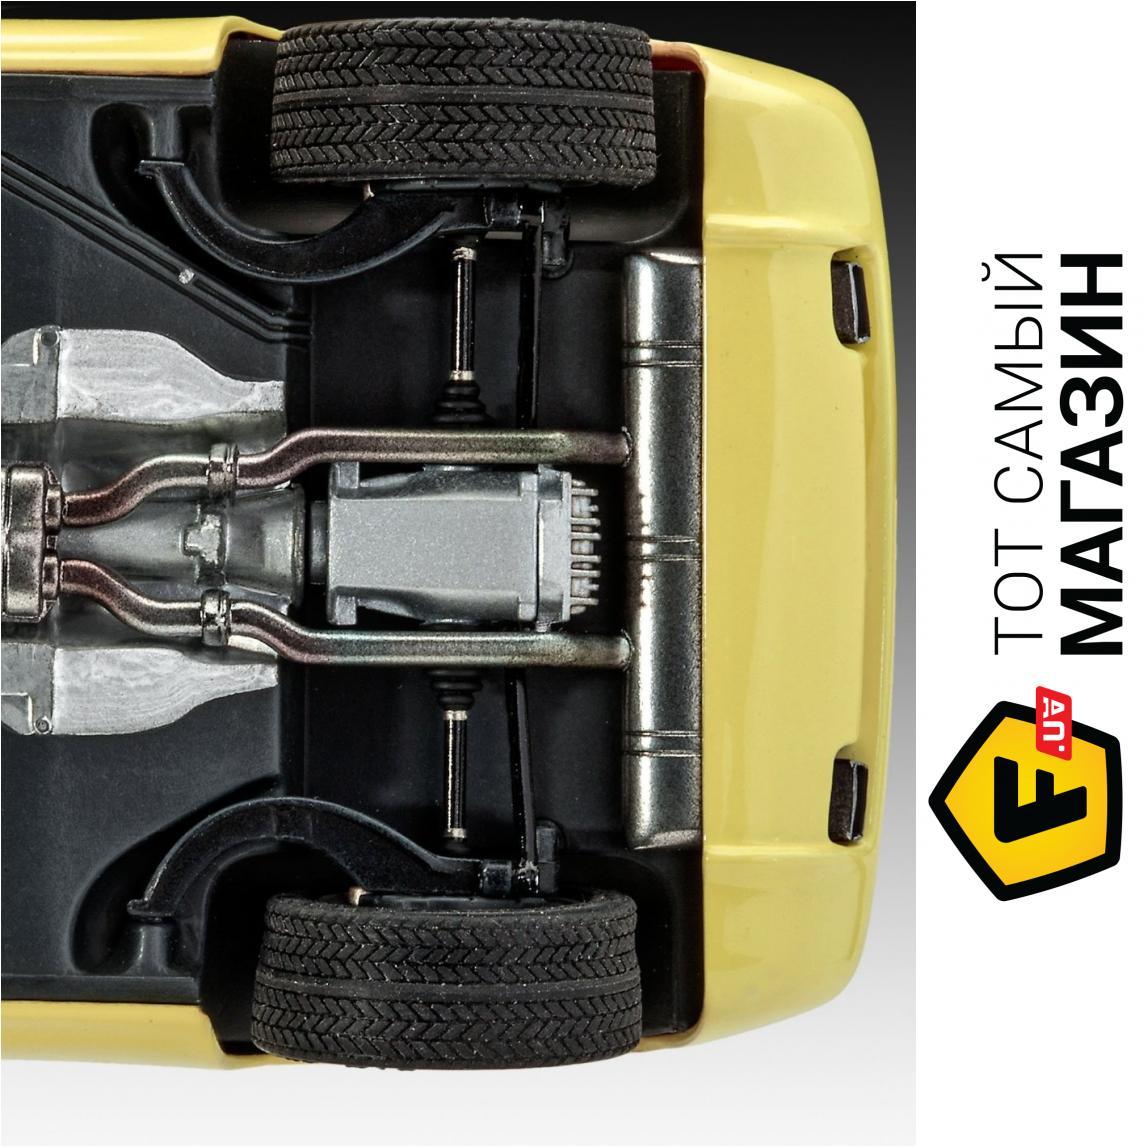 Модель 1:24 автомобили - Revell - Автомобиль BMW Z1, 1:24 ...